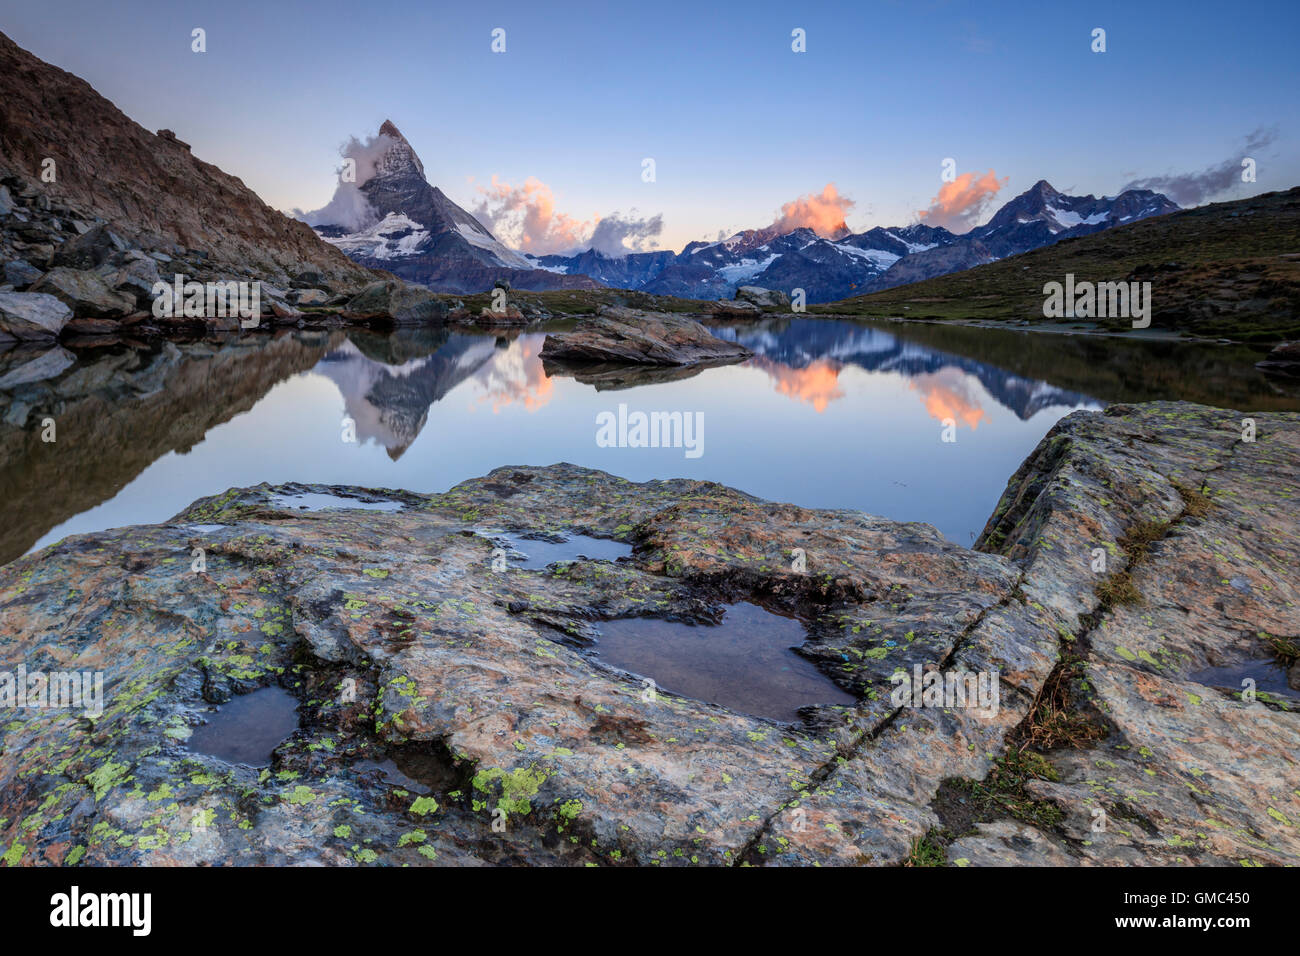 Matterhorn refleja en el lago al amanecer Stellisee Zermatt Alpes Peninos del cantón de Valais, Suiza Europa Imagen De Stock